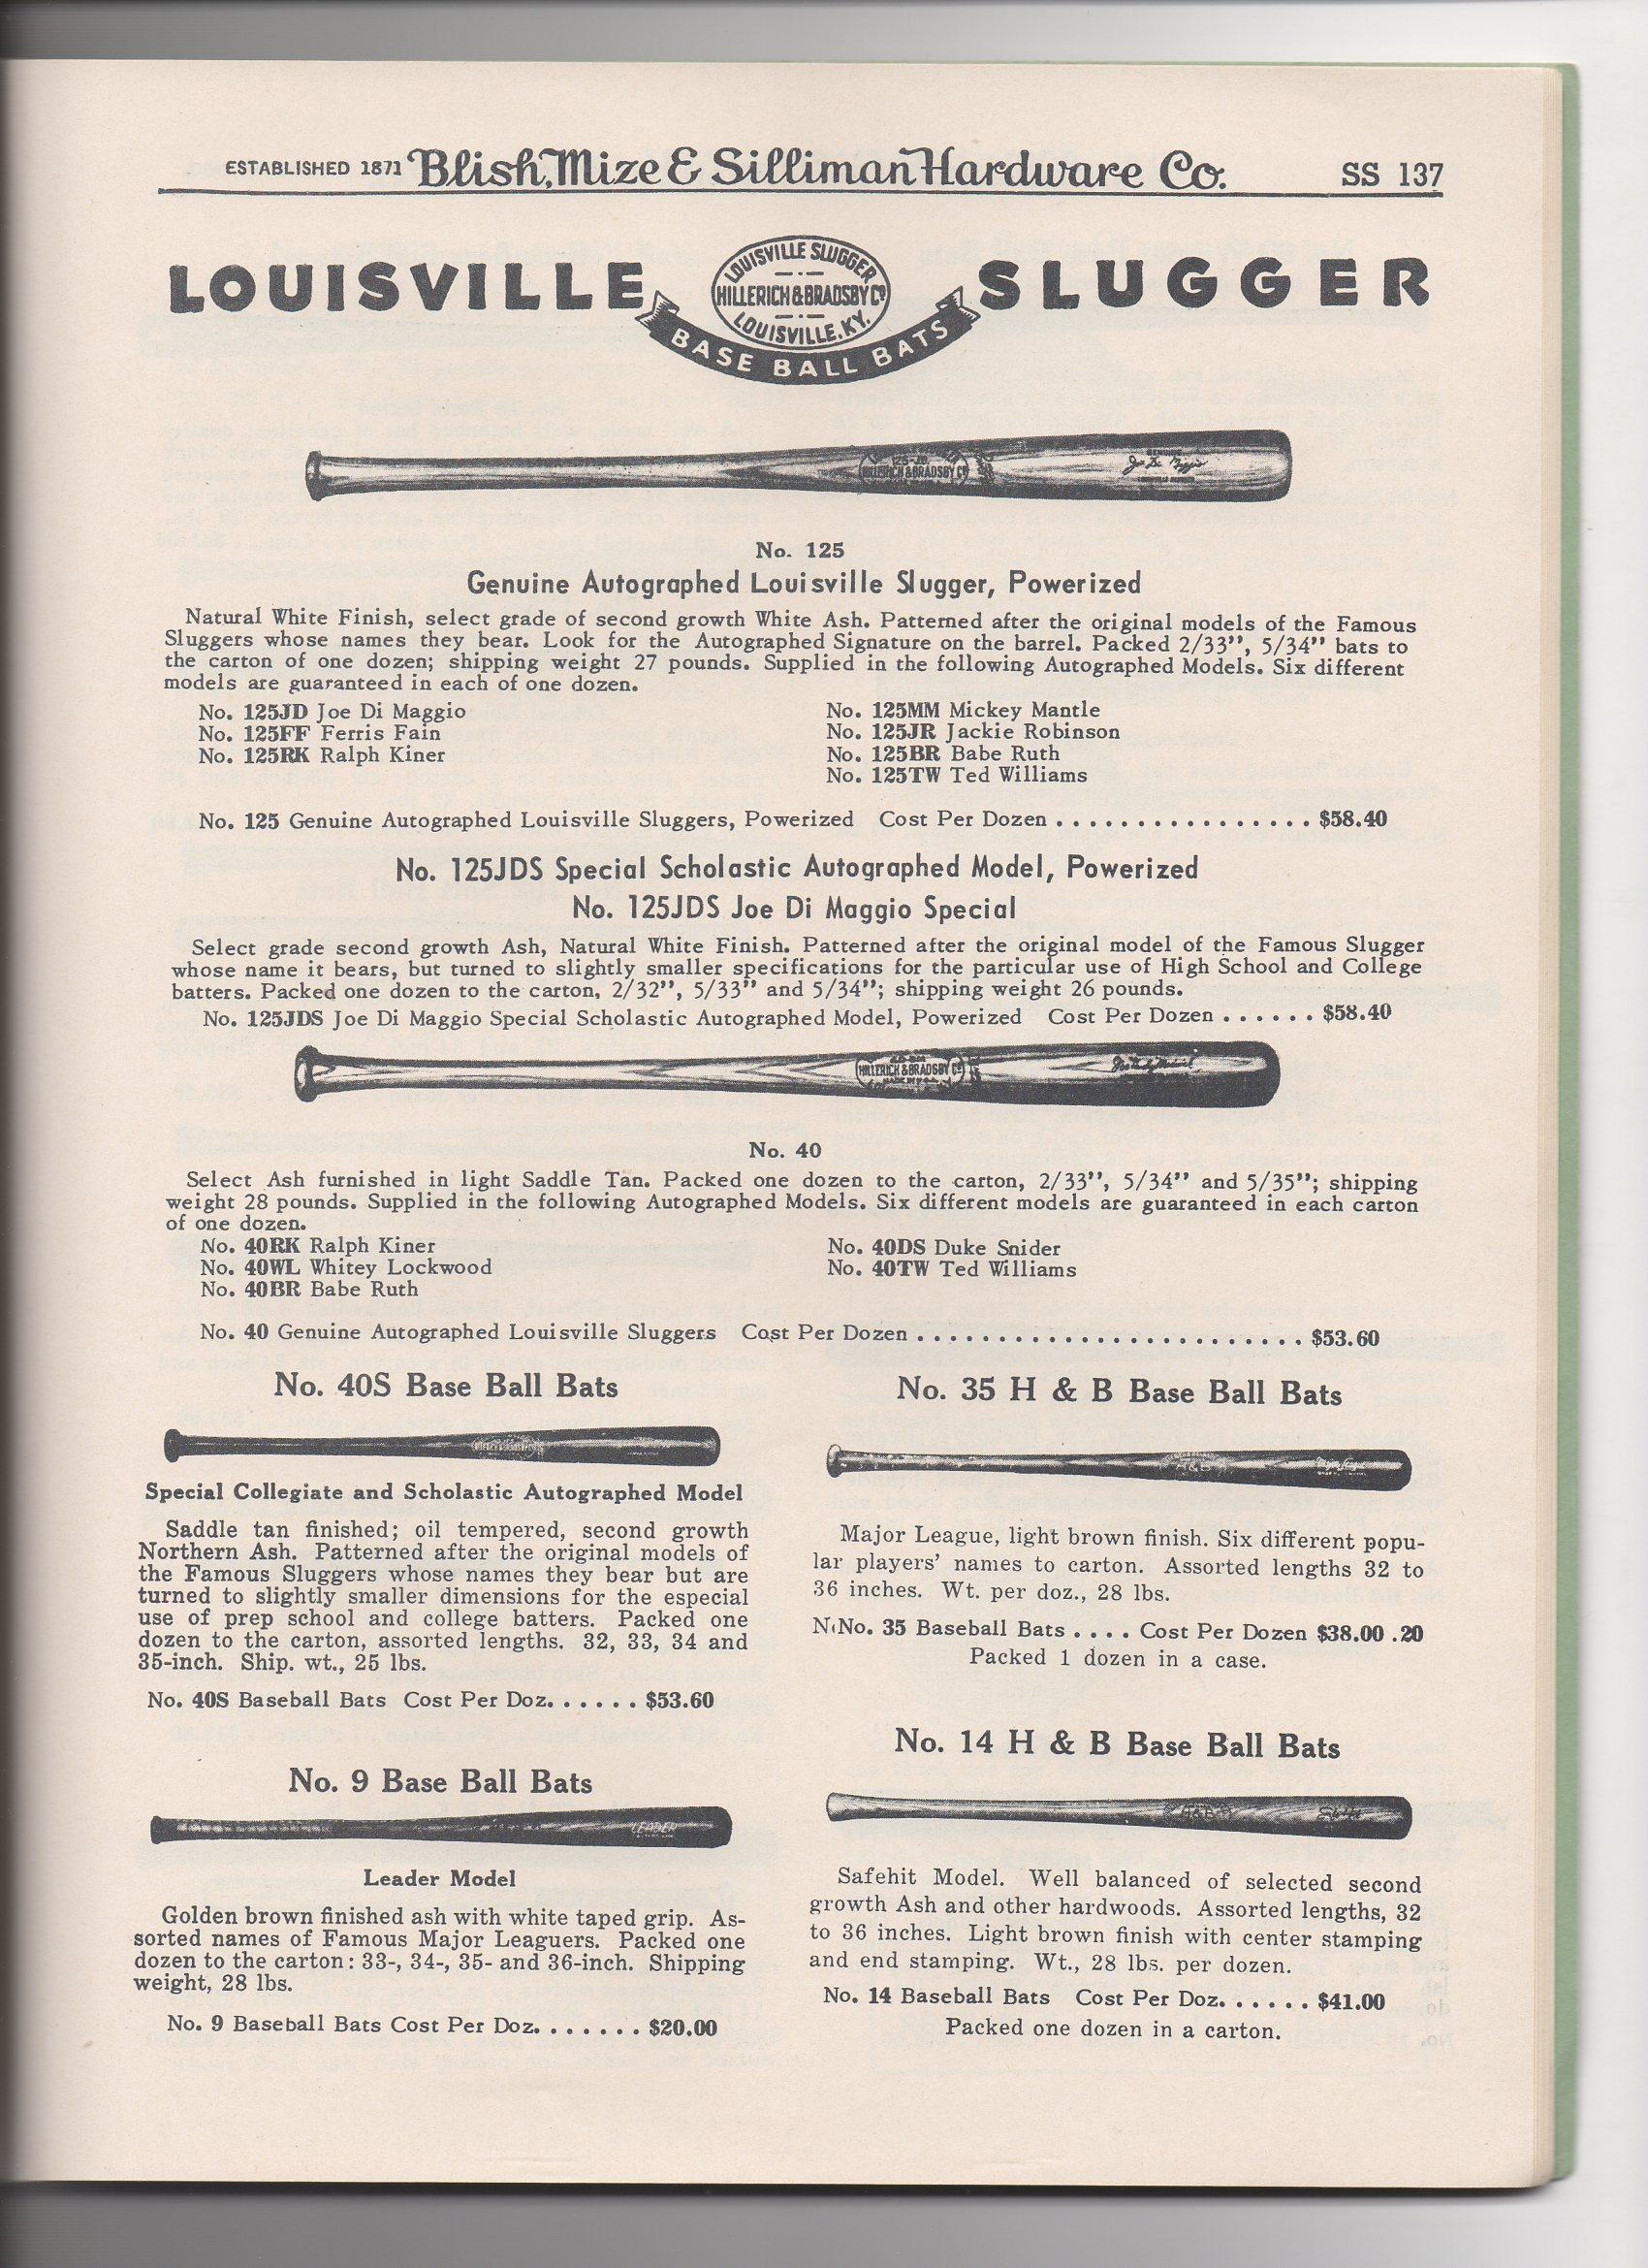 1963 blish, mize @ silliman hardware company